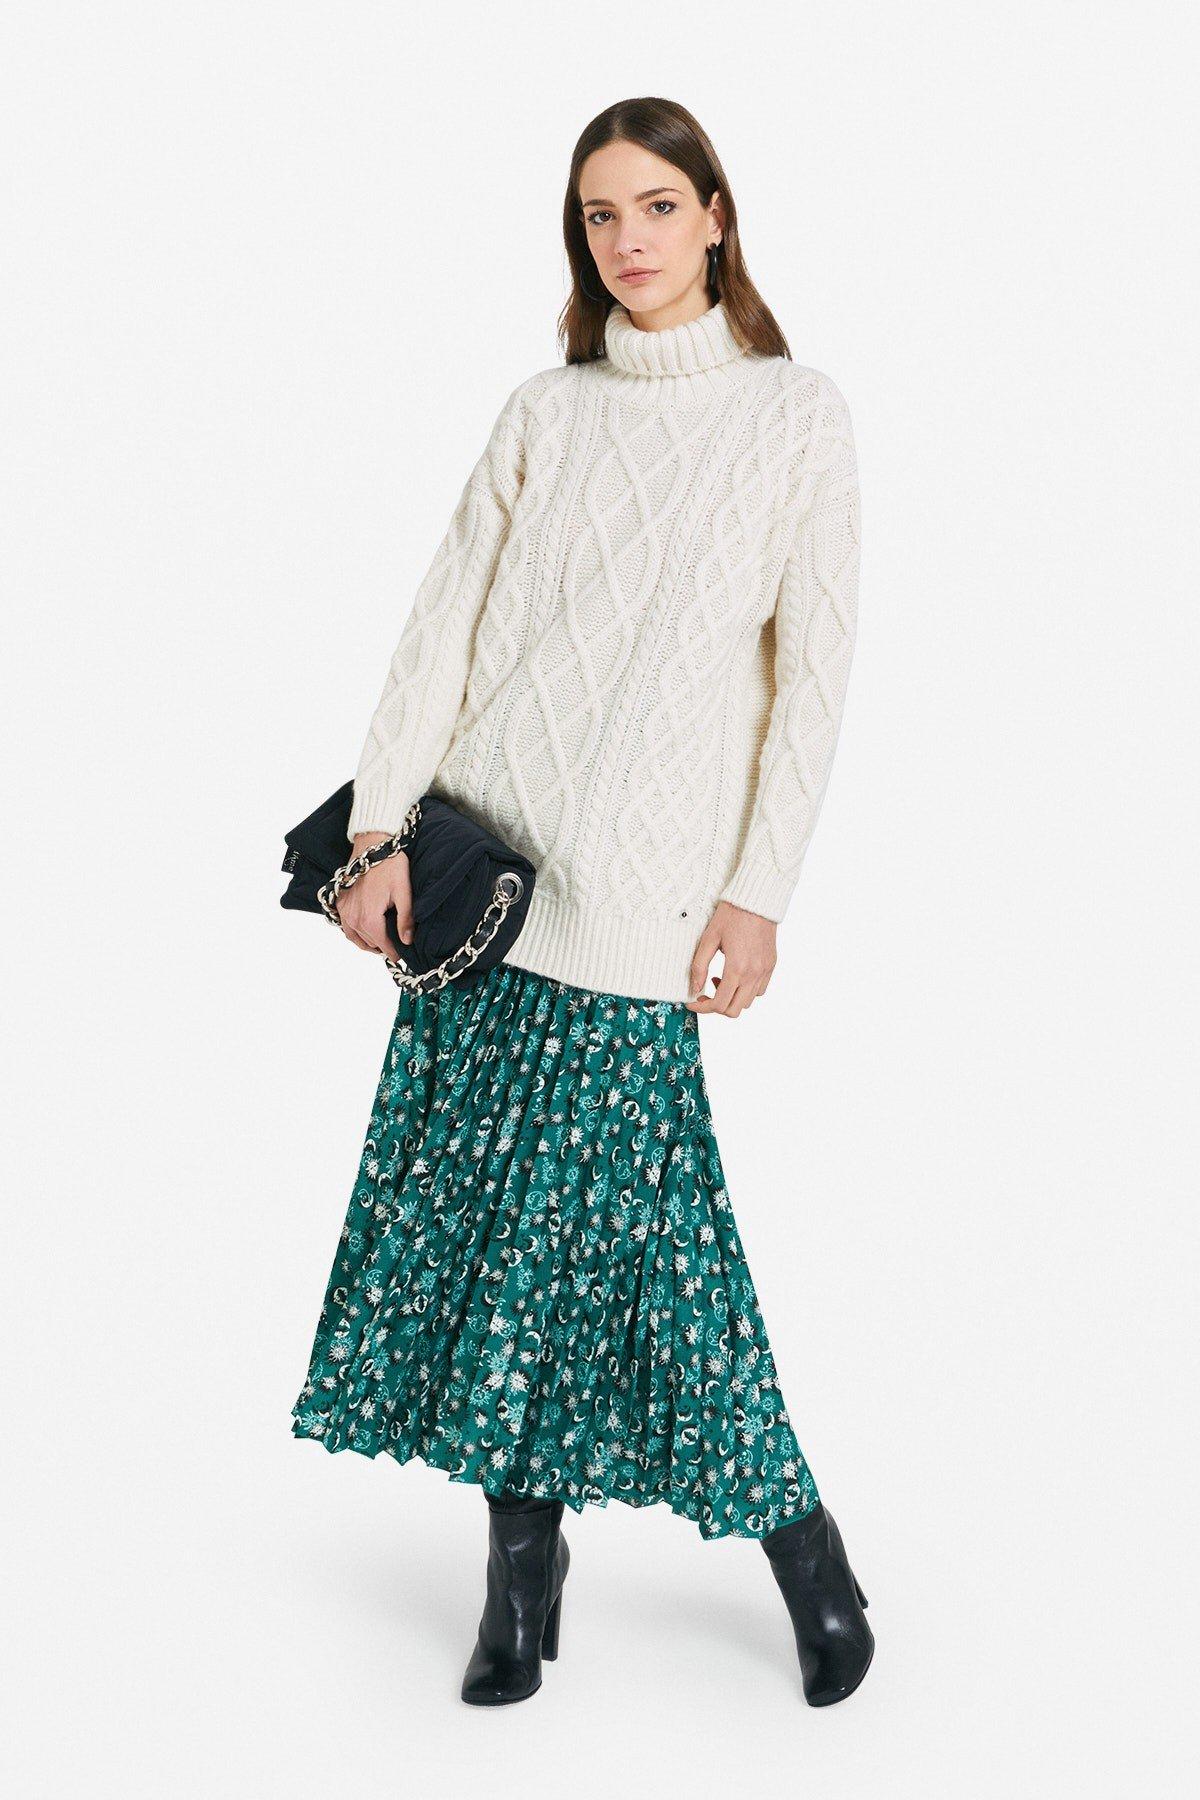 Processed wool blend jumper